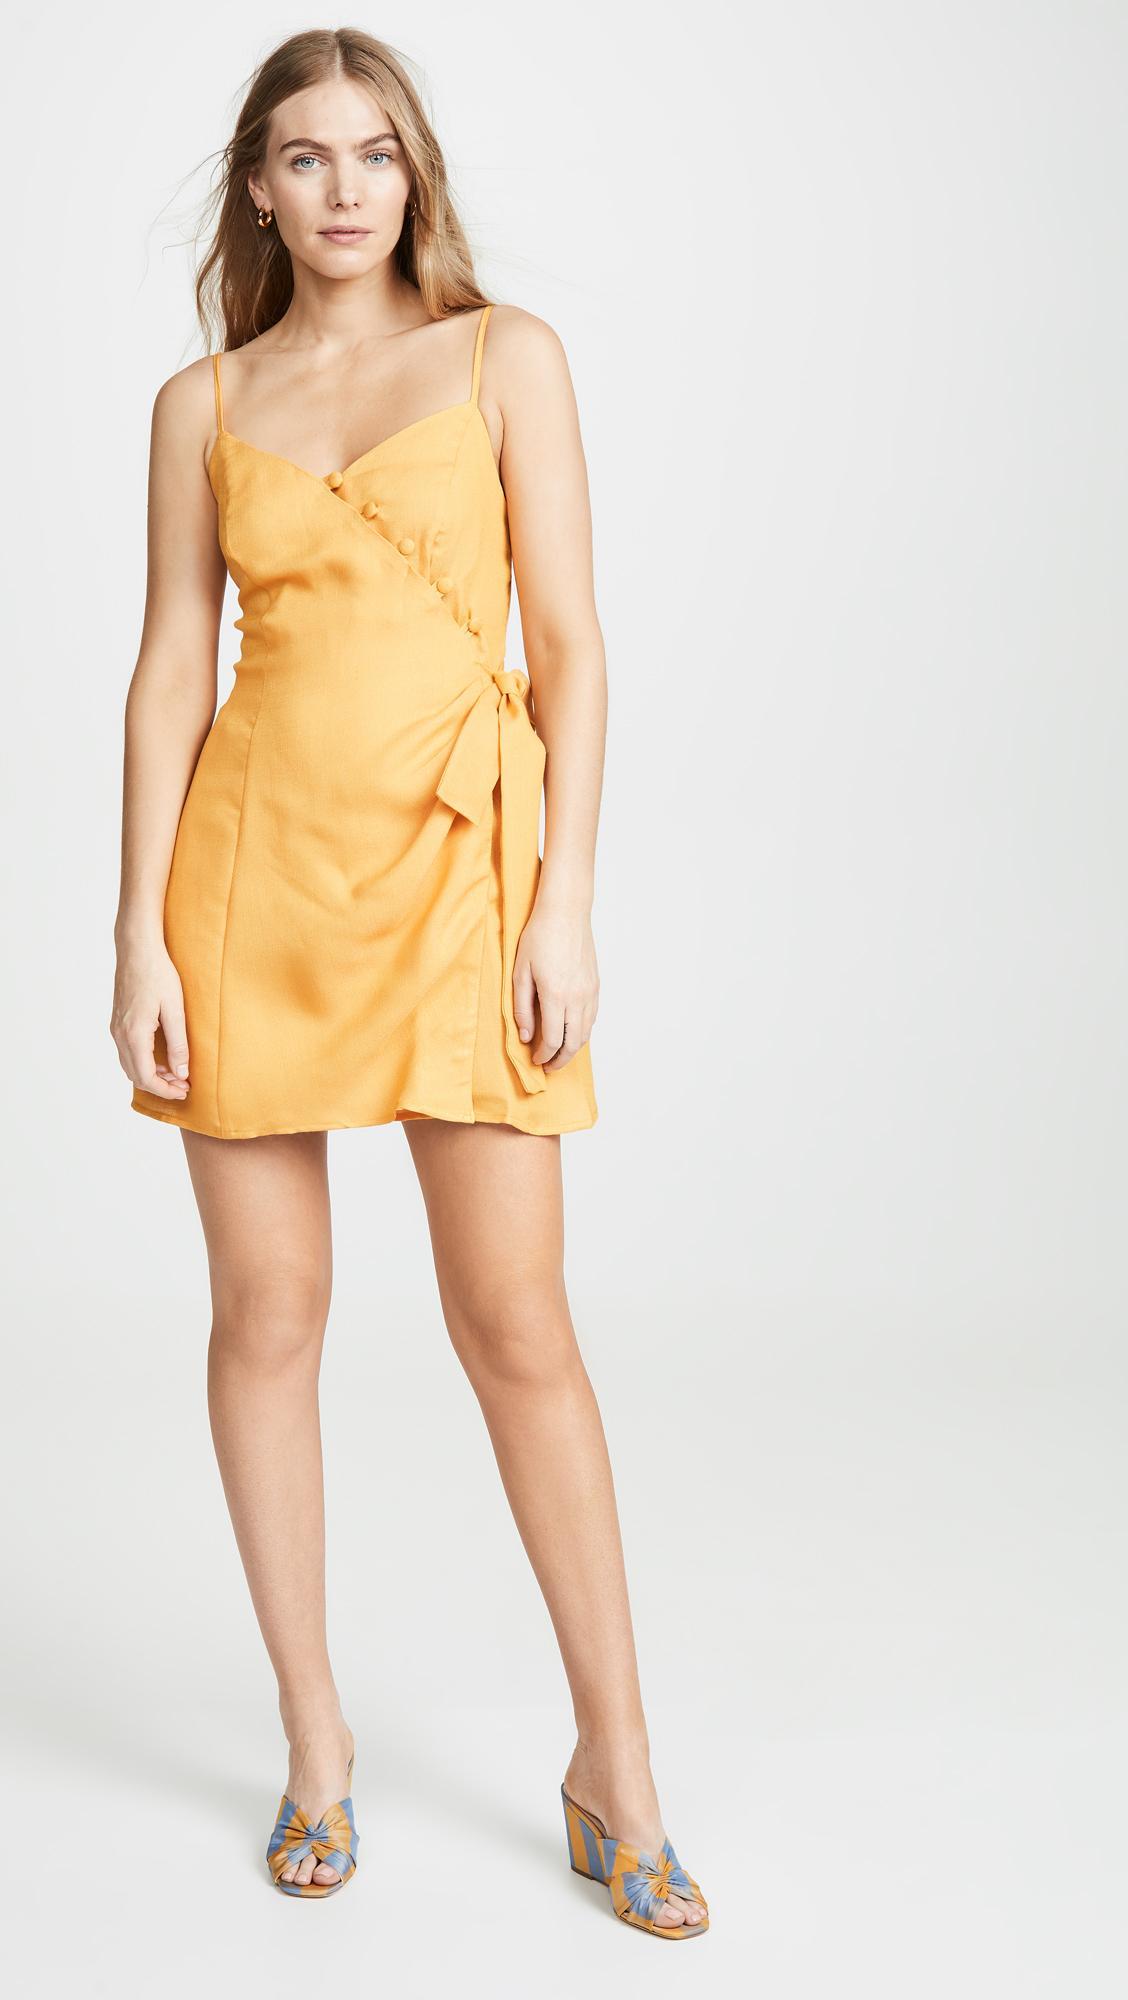 e32827d895bc Lyst - Moon River Tangerine Mini Dress in Yellow